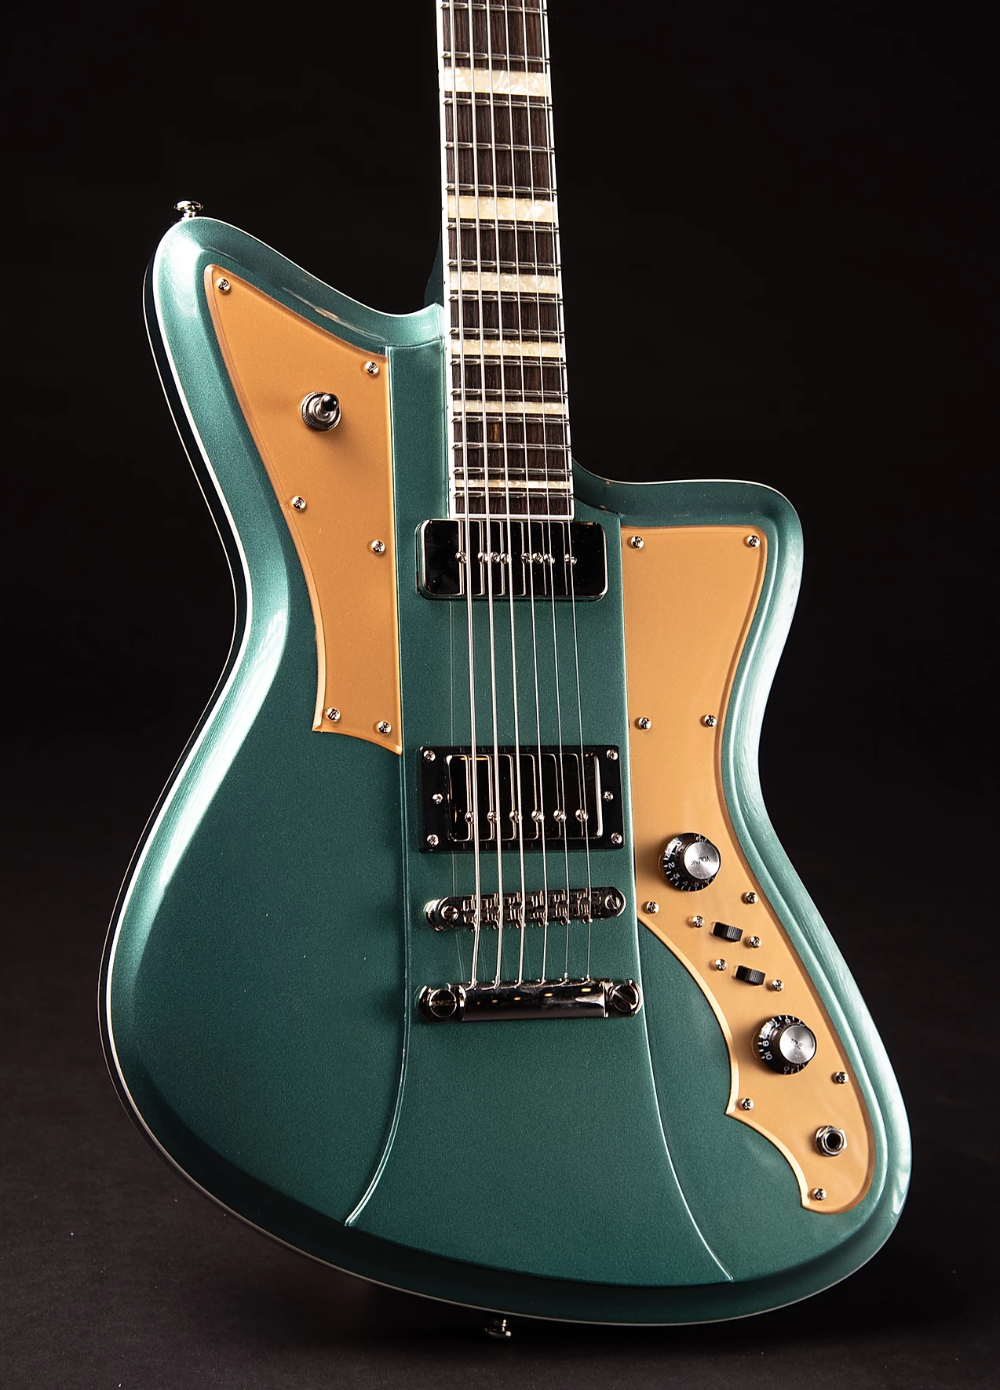 Mondata Baritone Vii Rivolta Guitars In 2020 Guitar Baritone Guitar Electric Guitar Design